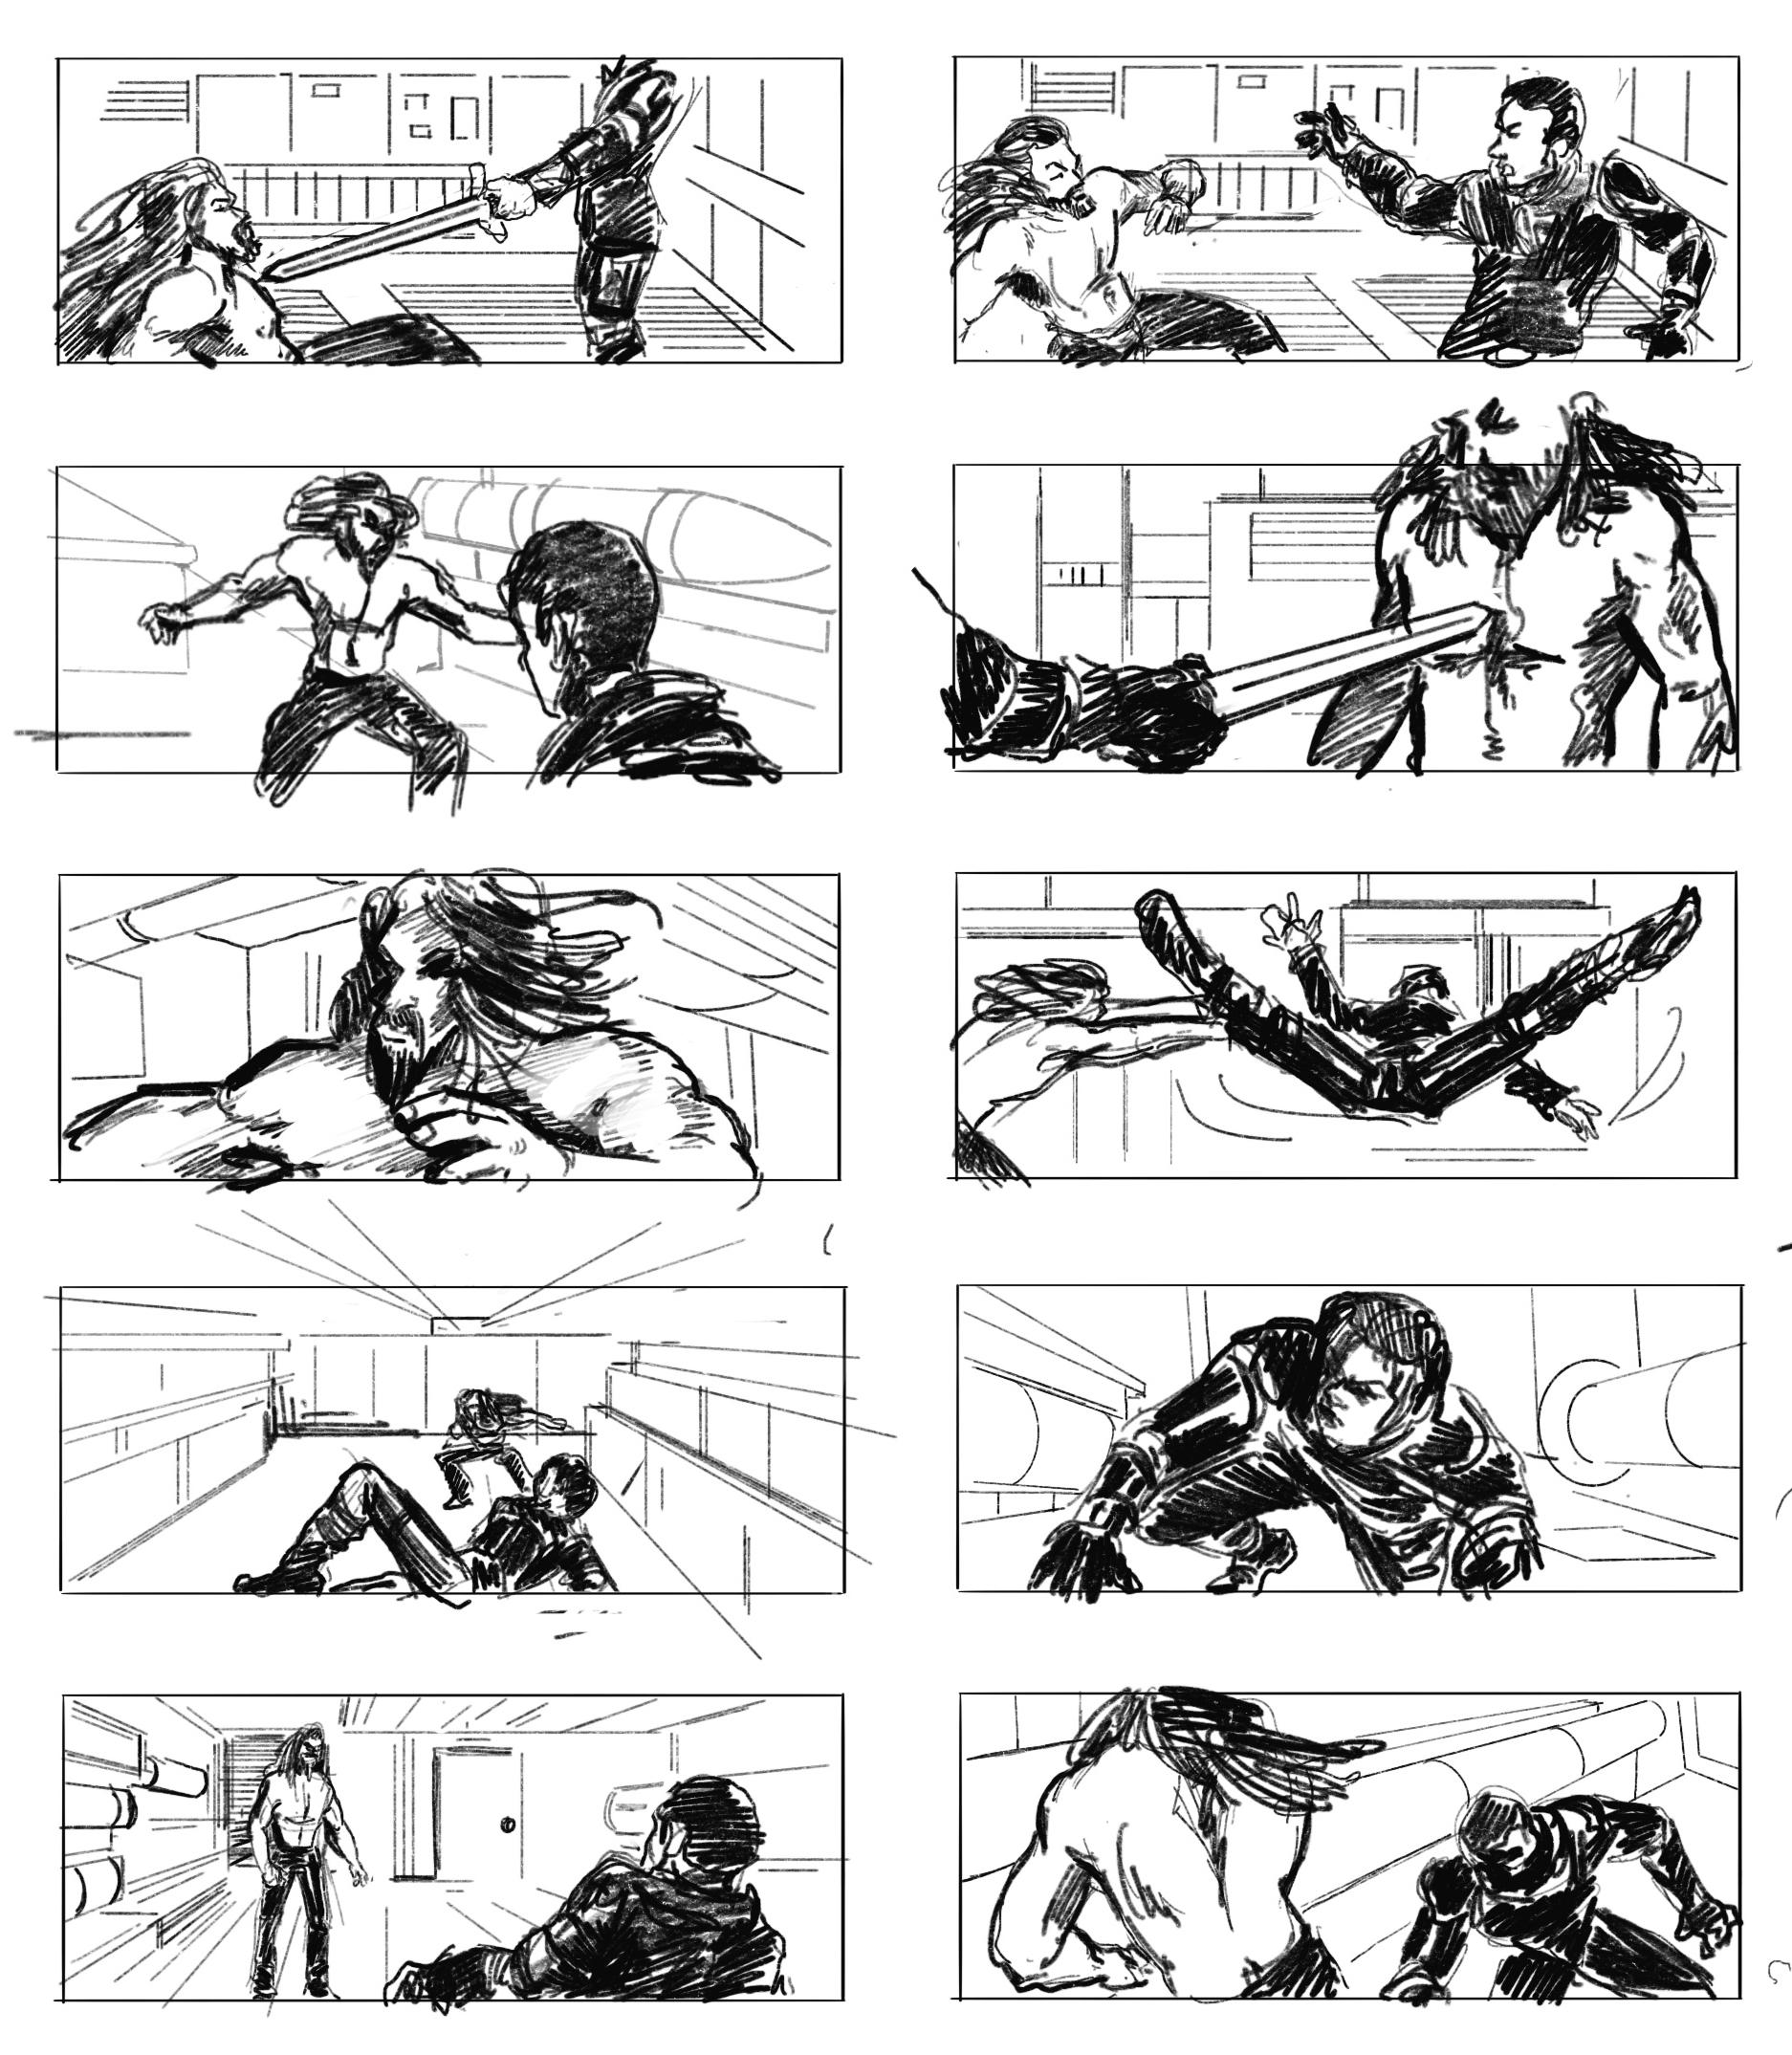 panels.jpg